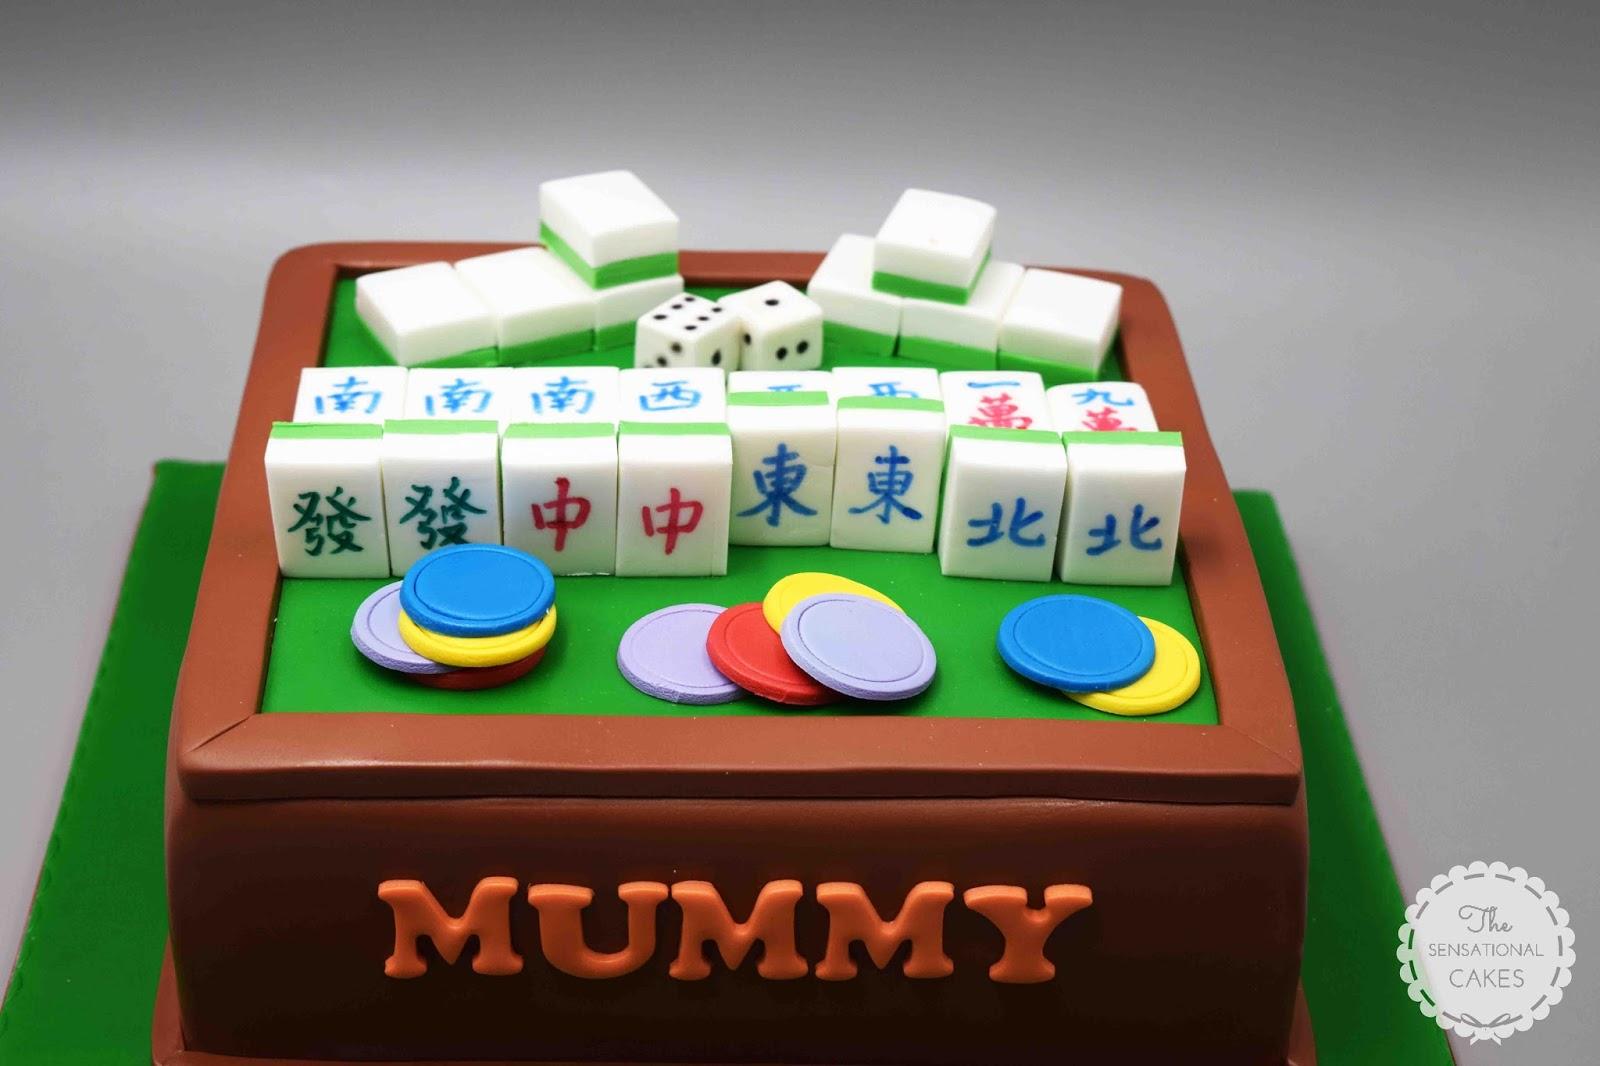 The Sensational Cakes Mahjong Play Inspired Theme 3d Cake Singapore